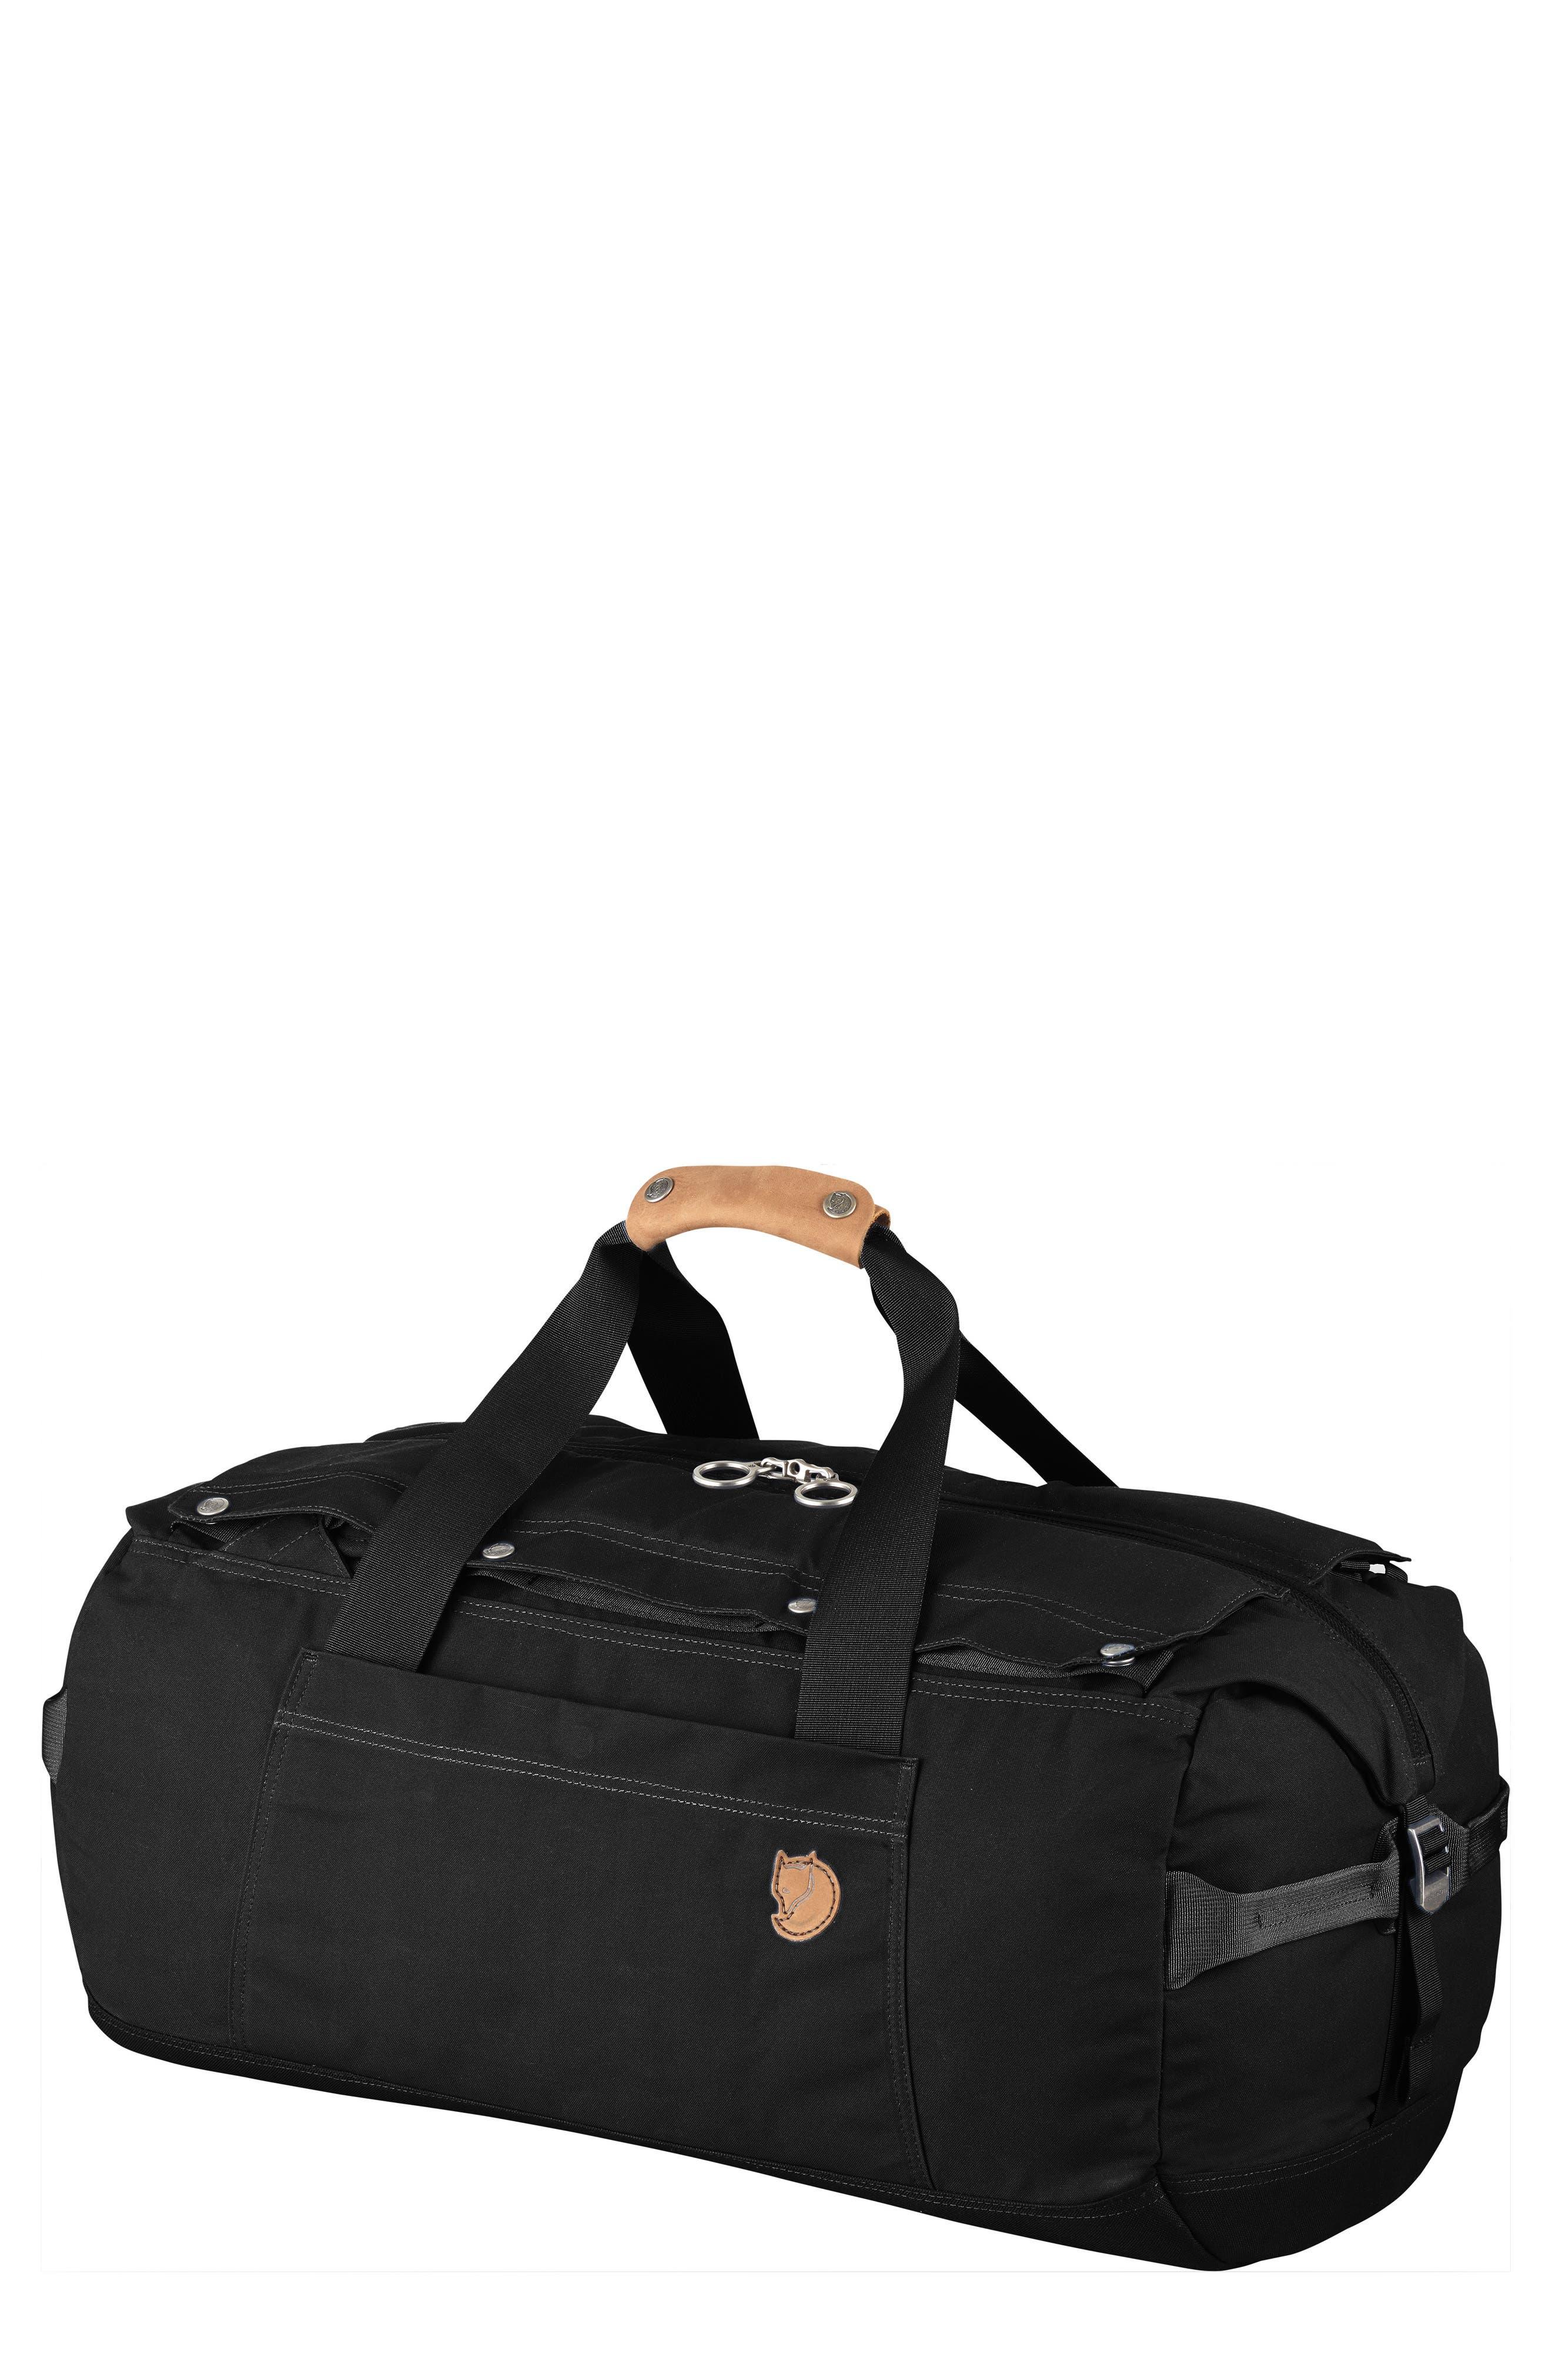 Duffel No. 6 Convertible Duffel Bag,                         Main,                         color, Black